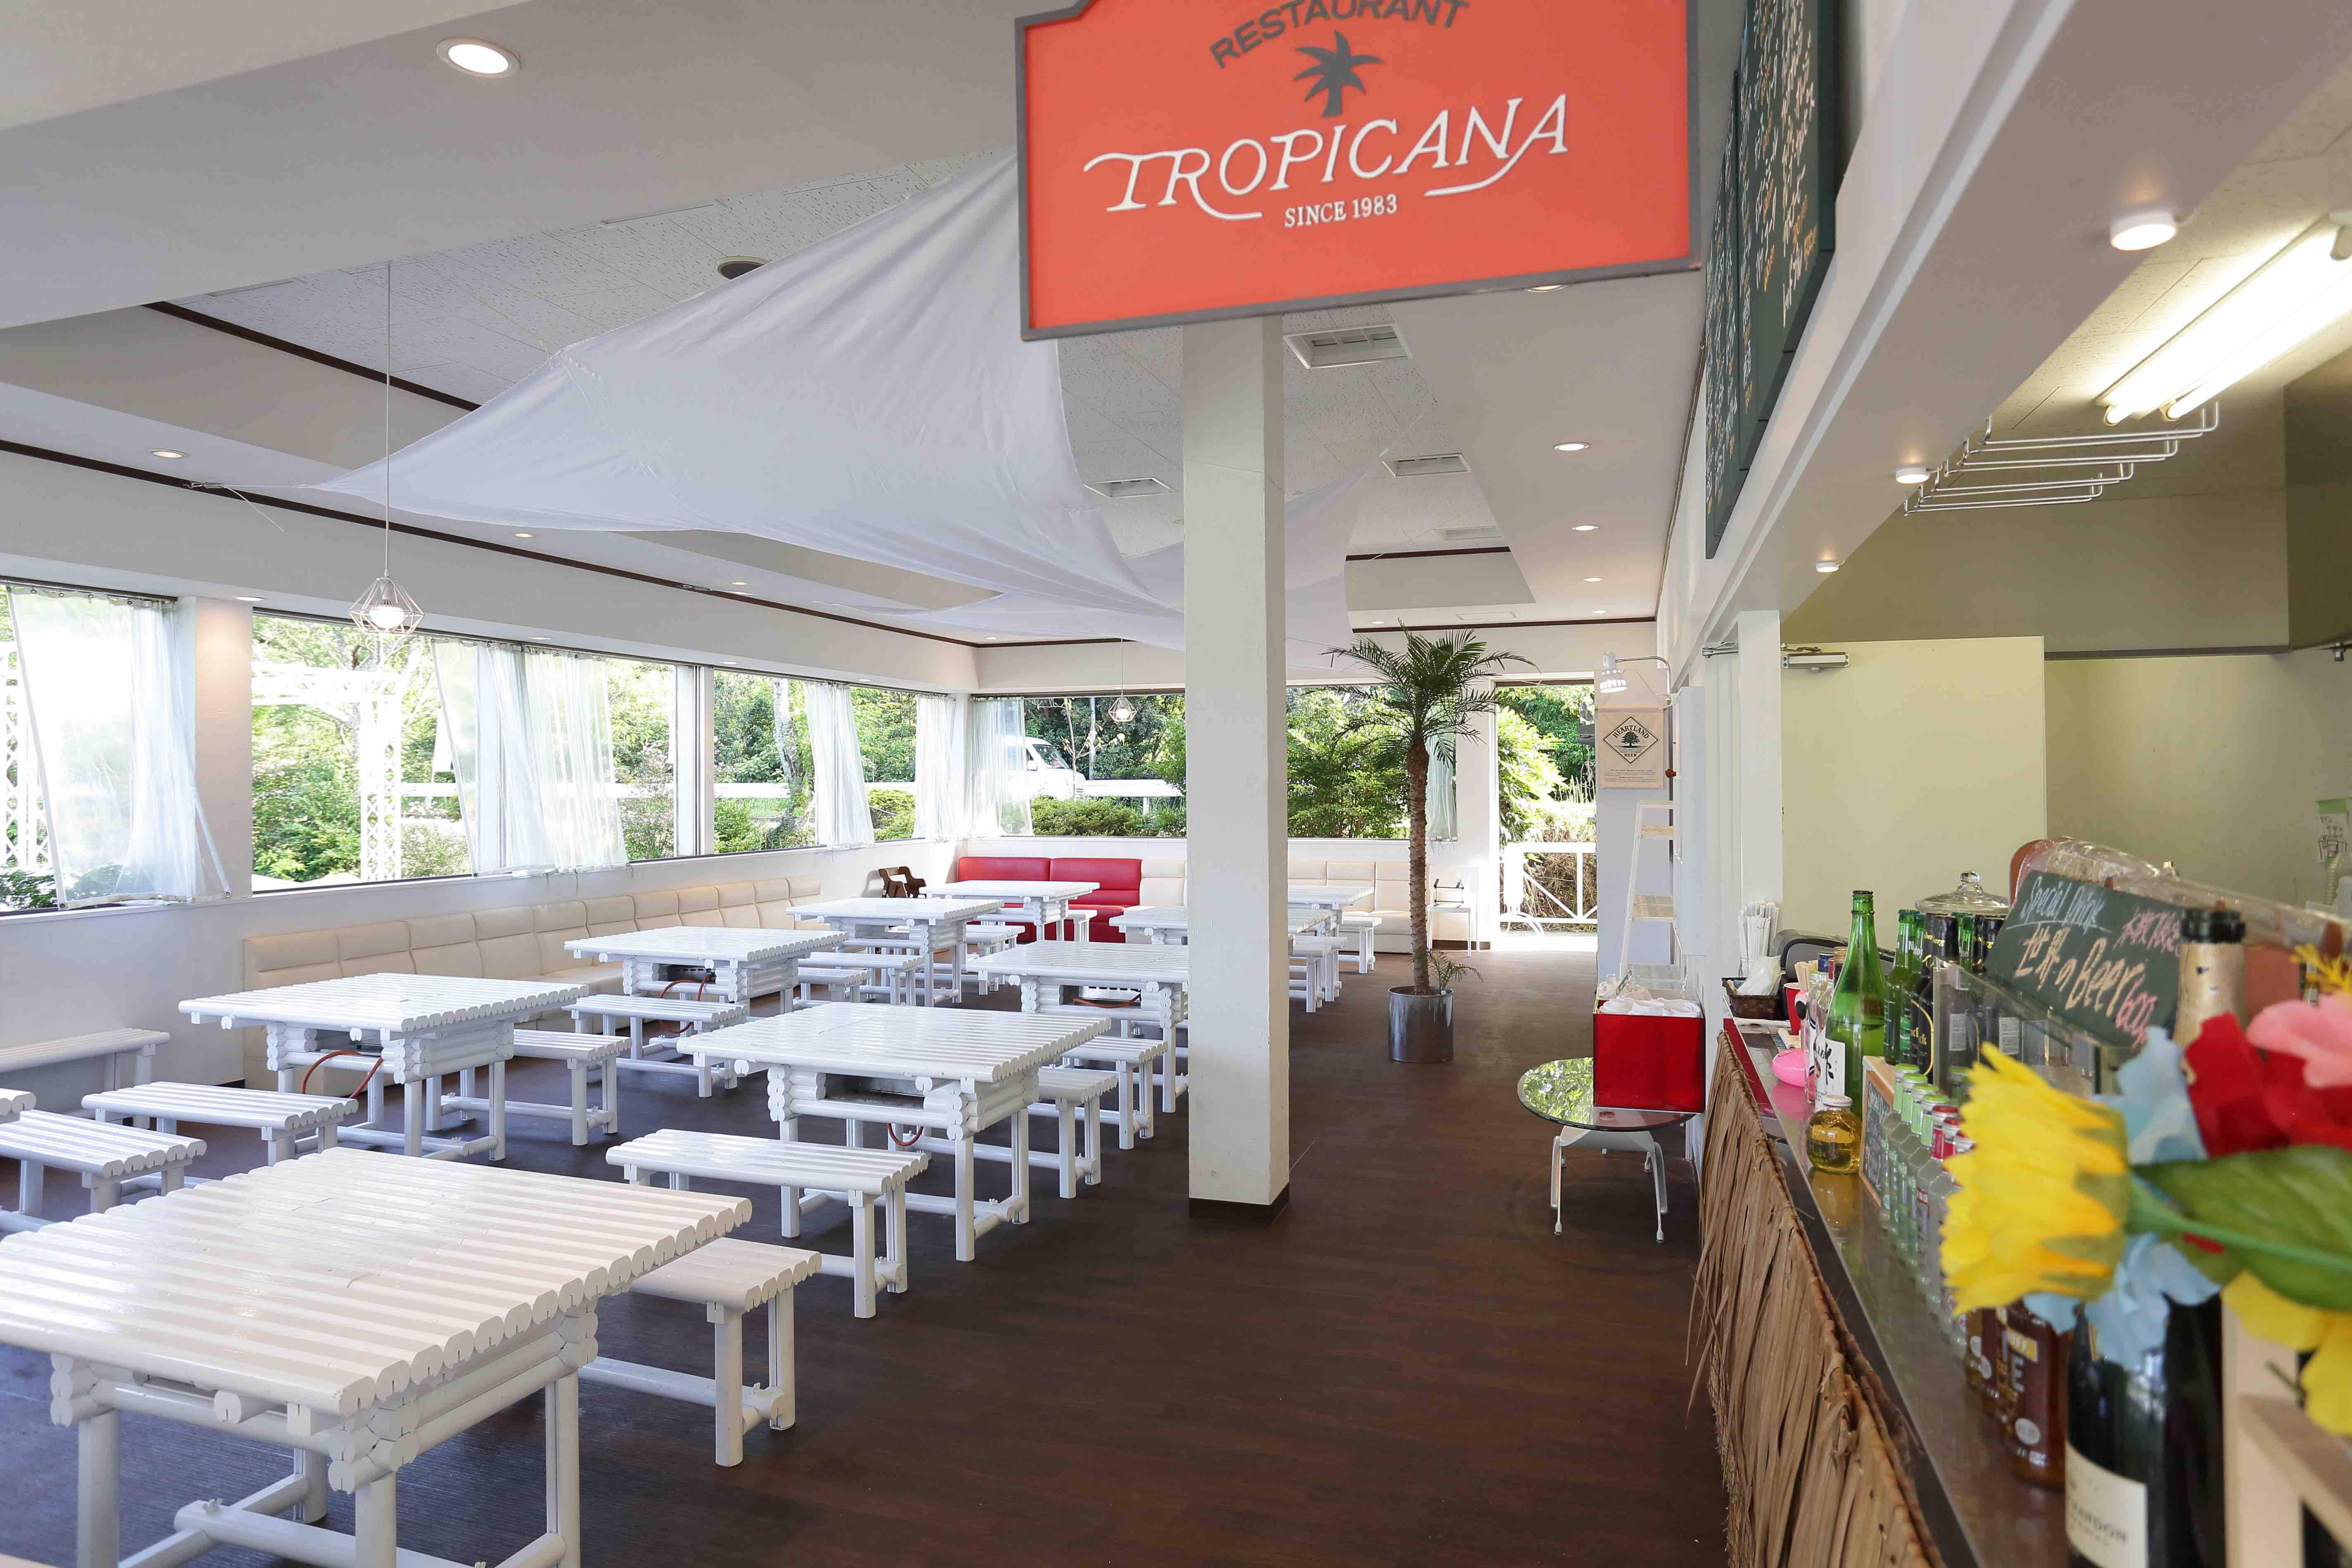 Beach Club Tropicana (ビーチクラブトロピカーナ)